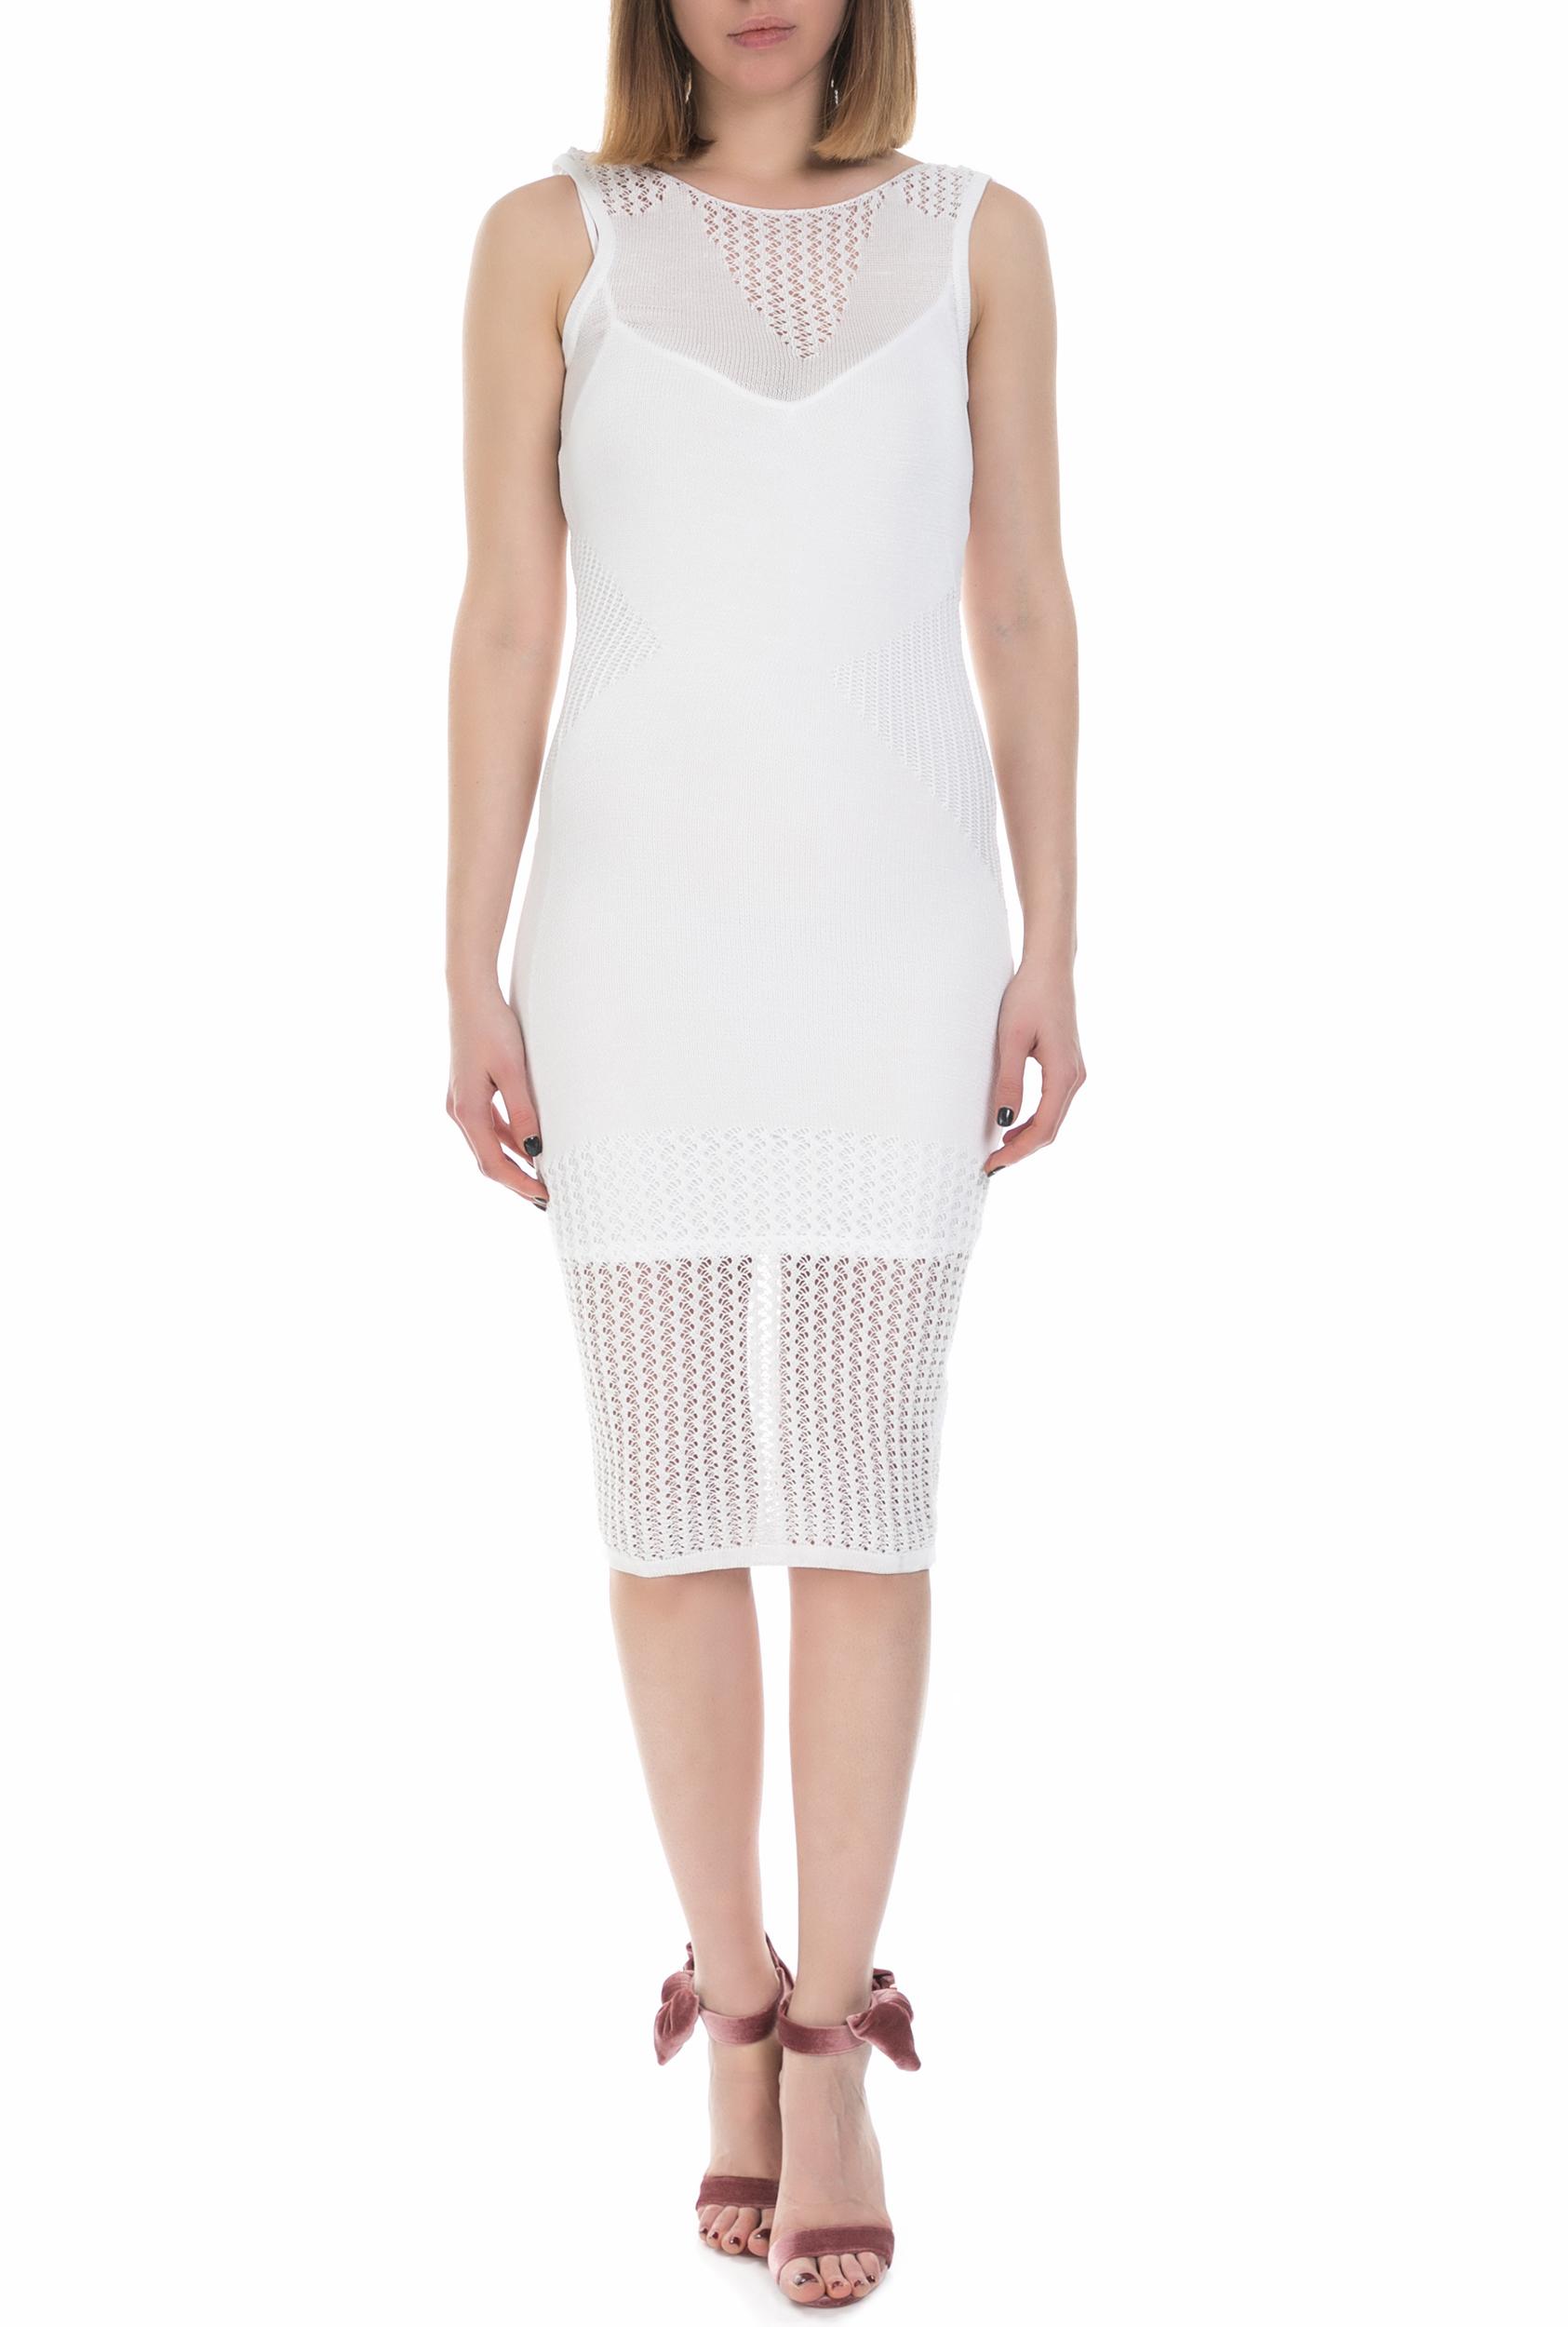 GUESS - Γυναικείο midi αμάνικο φόρεμα Guess λευκό γυναικεία ρούχα φορέματα μέχρι το γόνατο